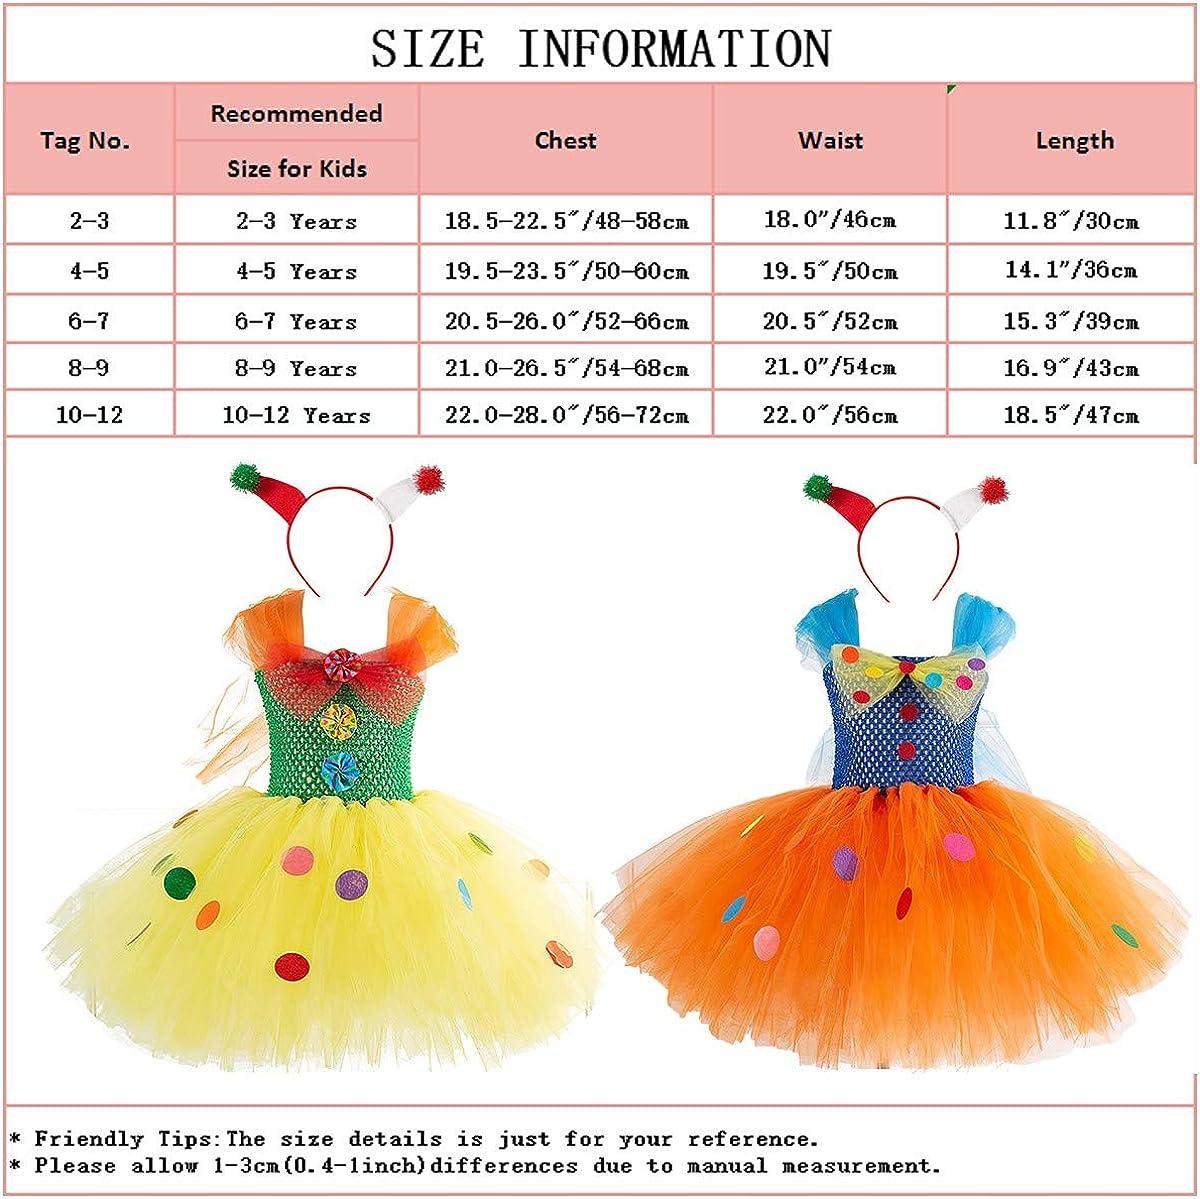 HIHCBF Circus Clown Girl Costume Handmade Tutu Dress Kids Funny Role Play Halloween Christmas Carnival Outfits w//Hair Hoop